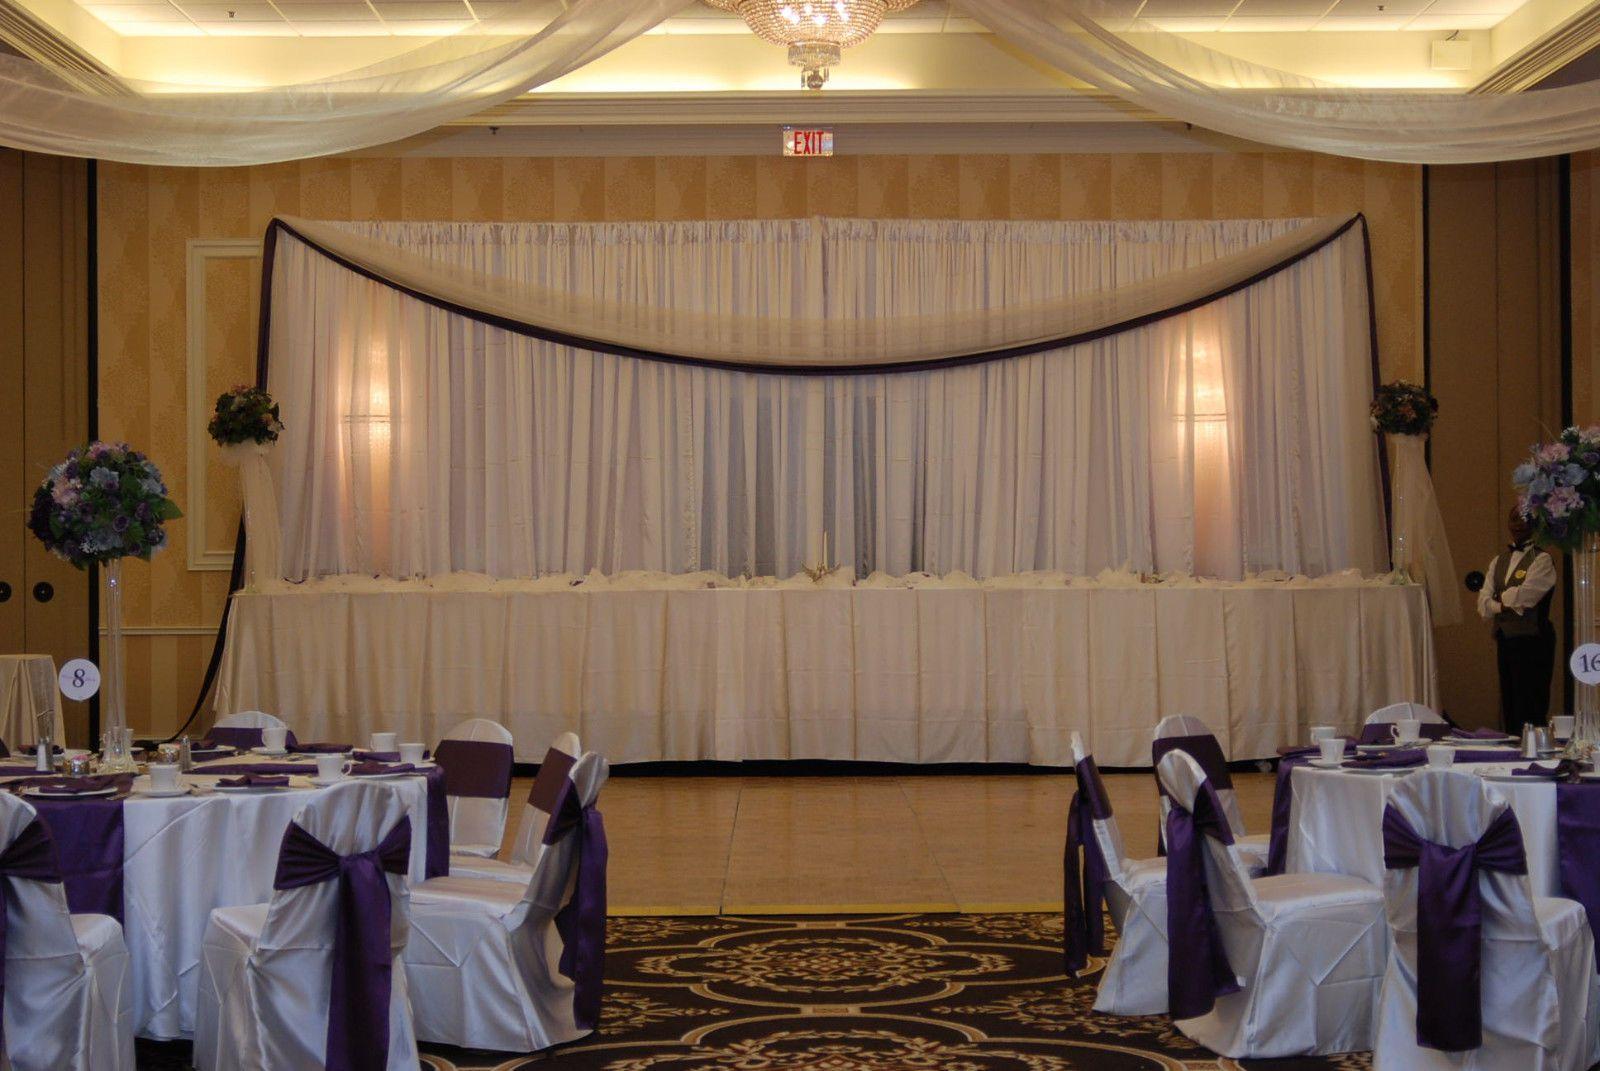 Wedding Curtain Backdrops Wedding Stage Decorations Wedding Backdrop Wedding Props Satin Drape